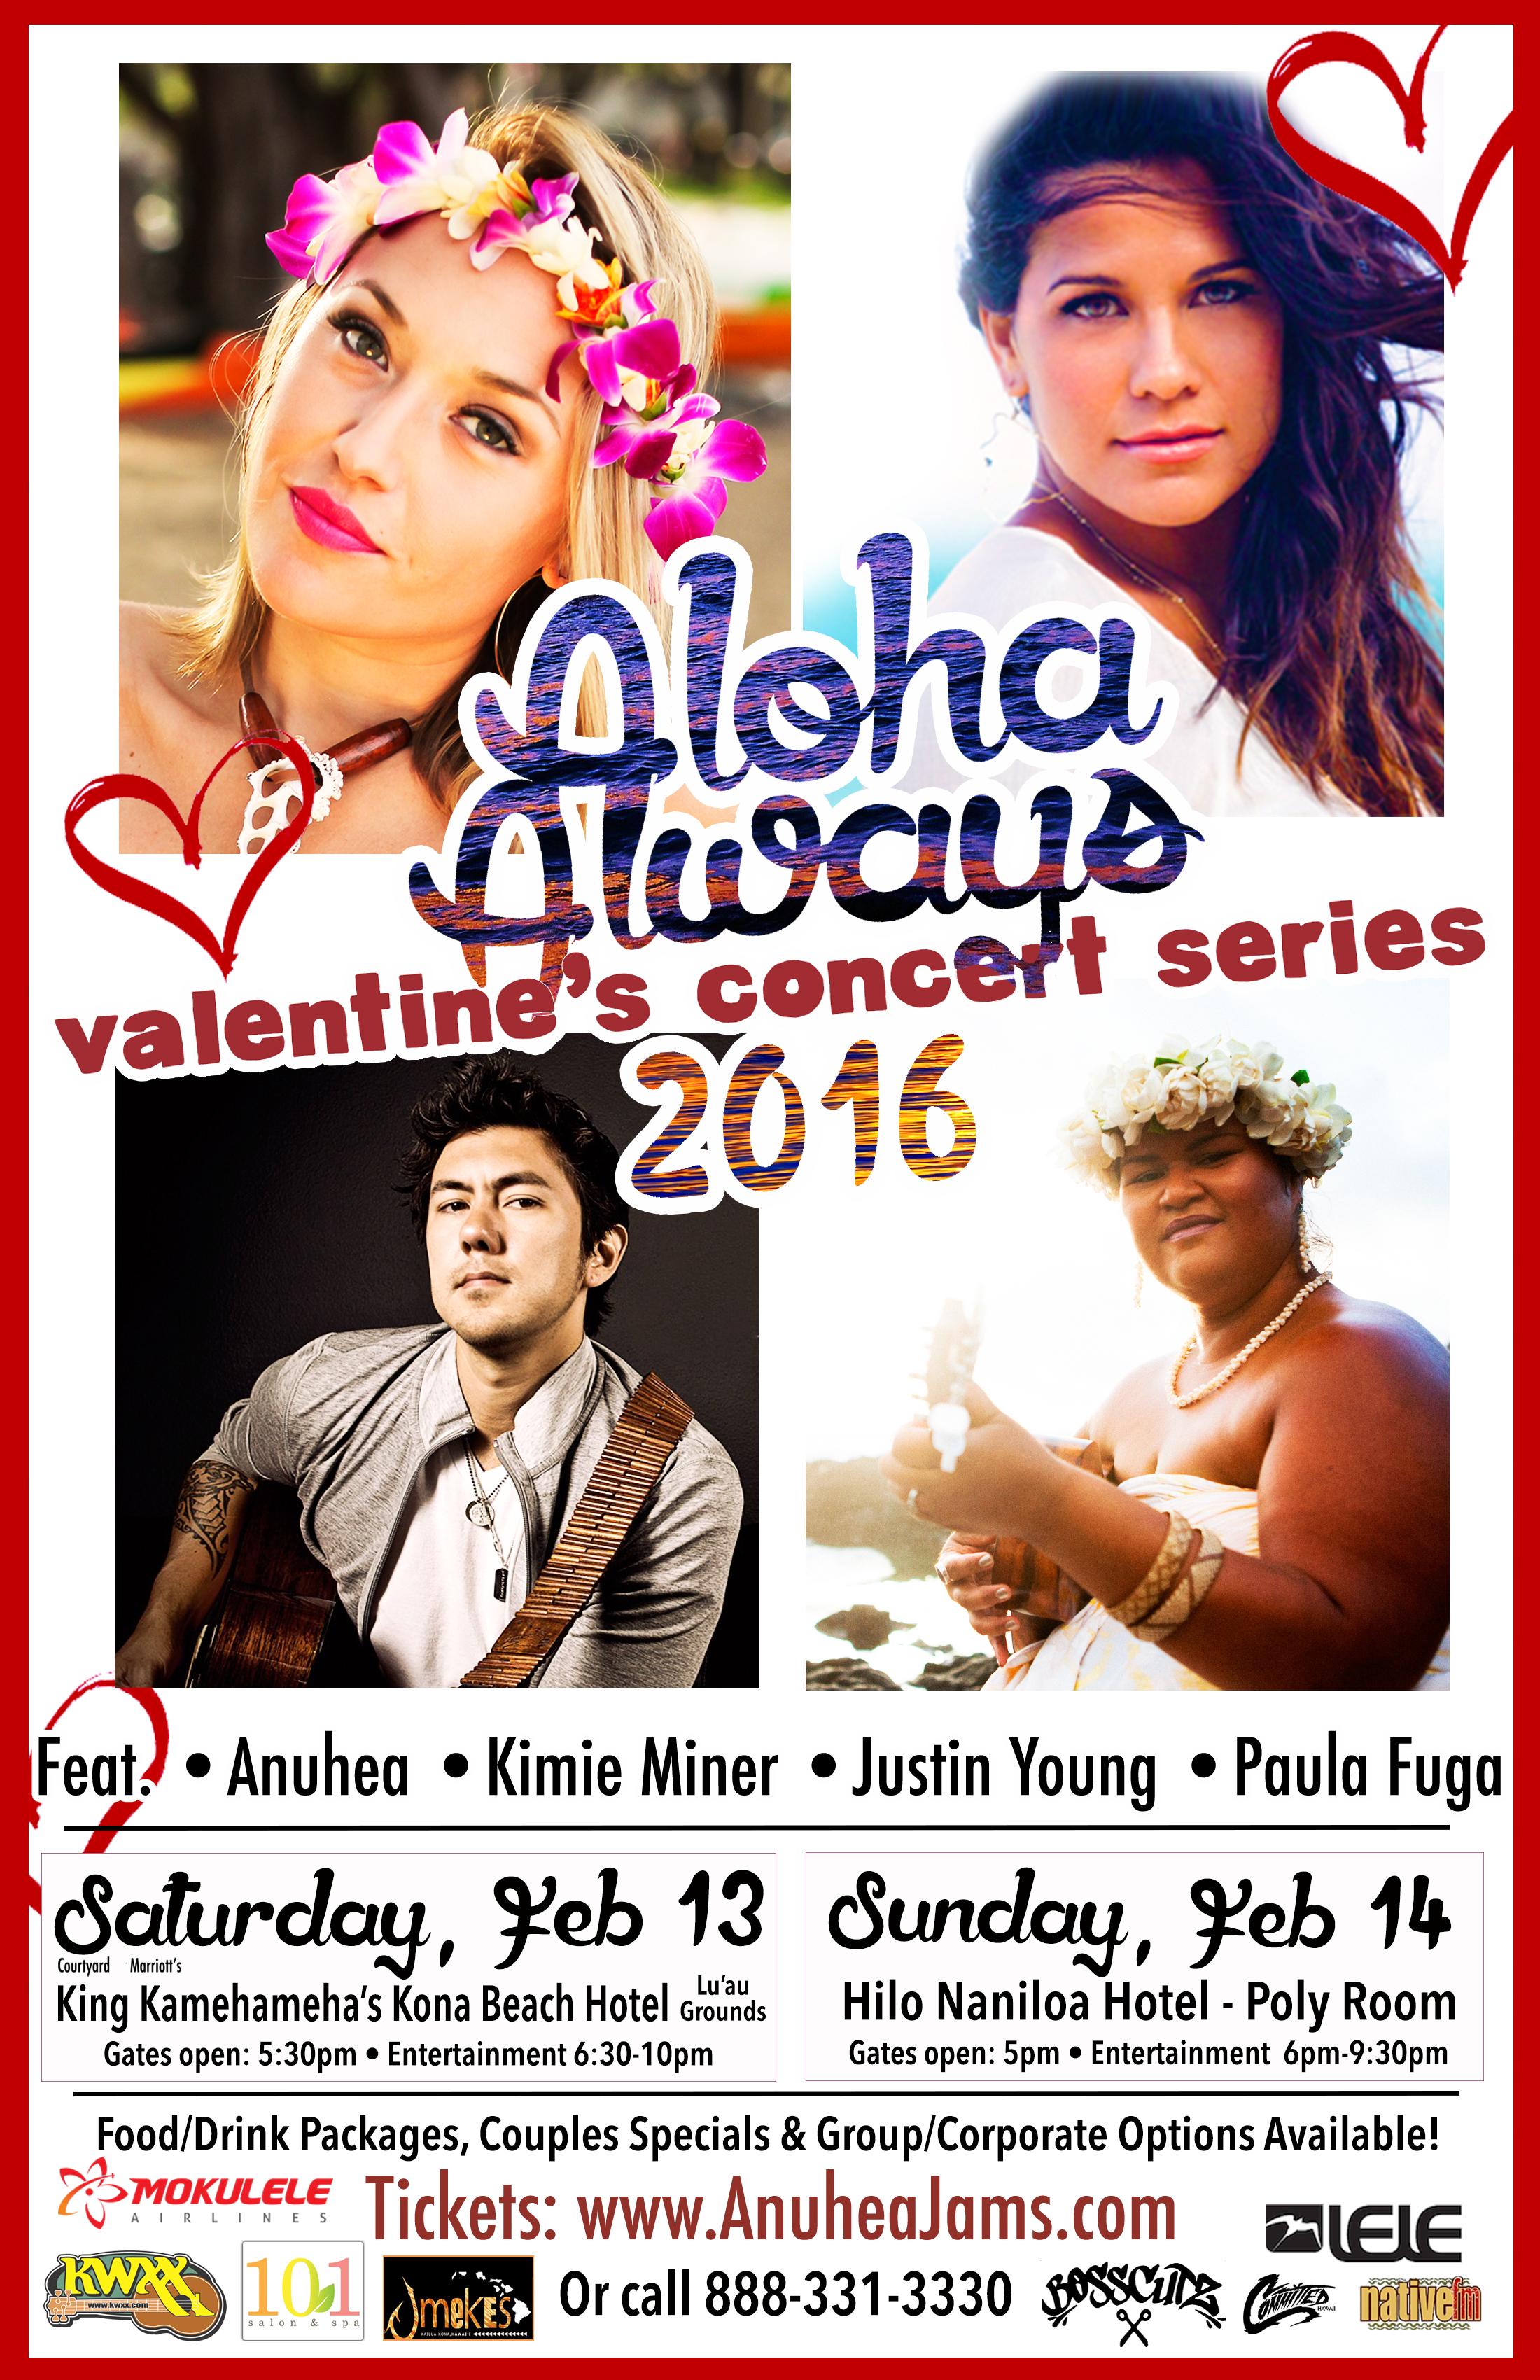 Aloha Always Concert BOTH DATES